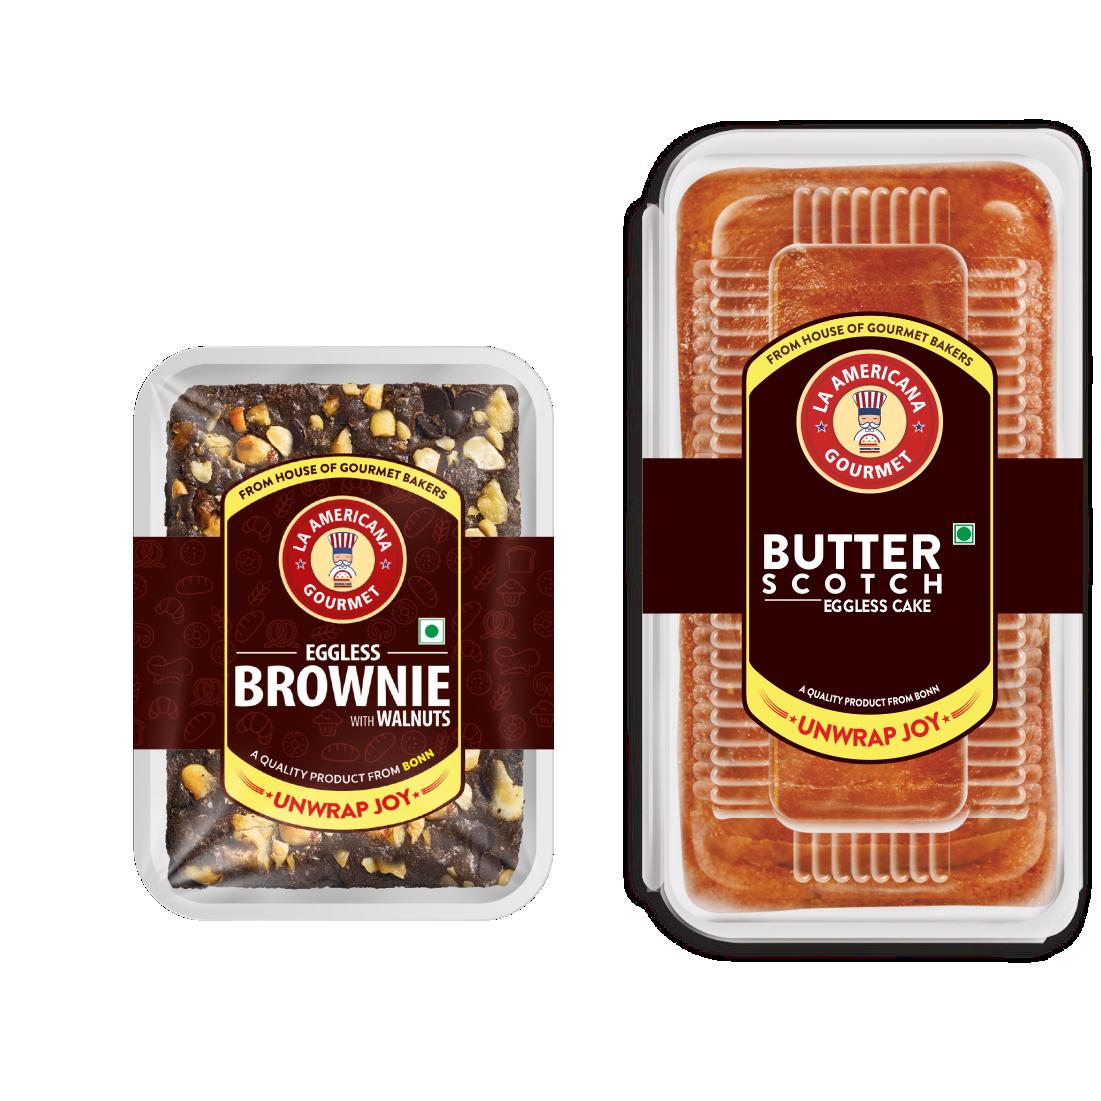 LA Americana Eggless Walnut Brownie 70g and Eggless Butter Scotch Cake 200g (2 Packs Each)